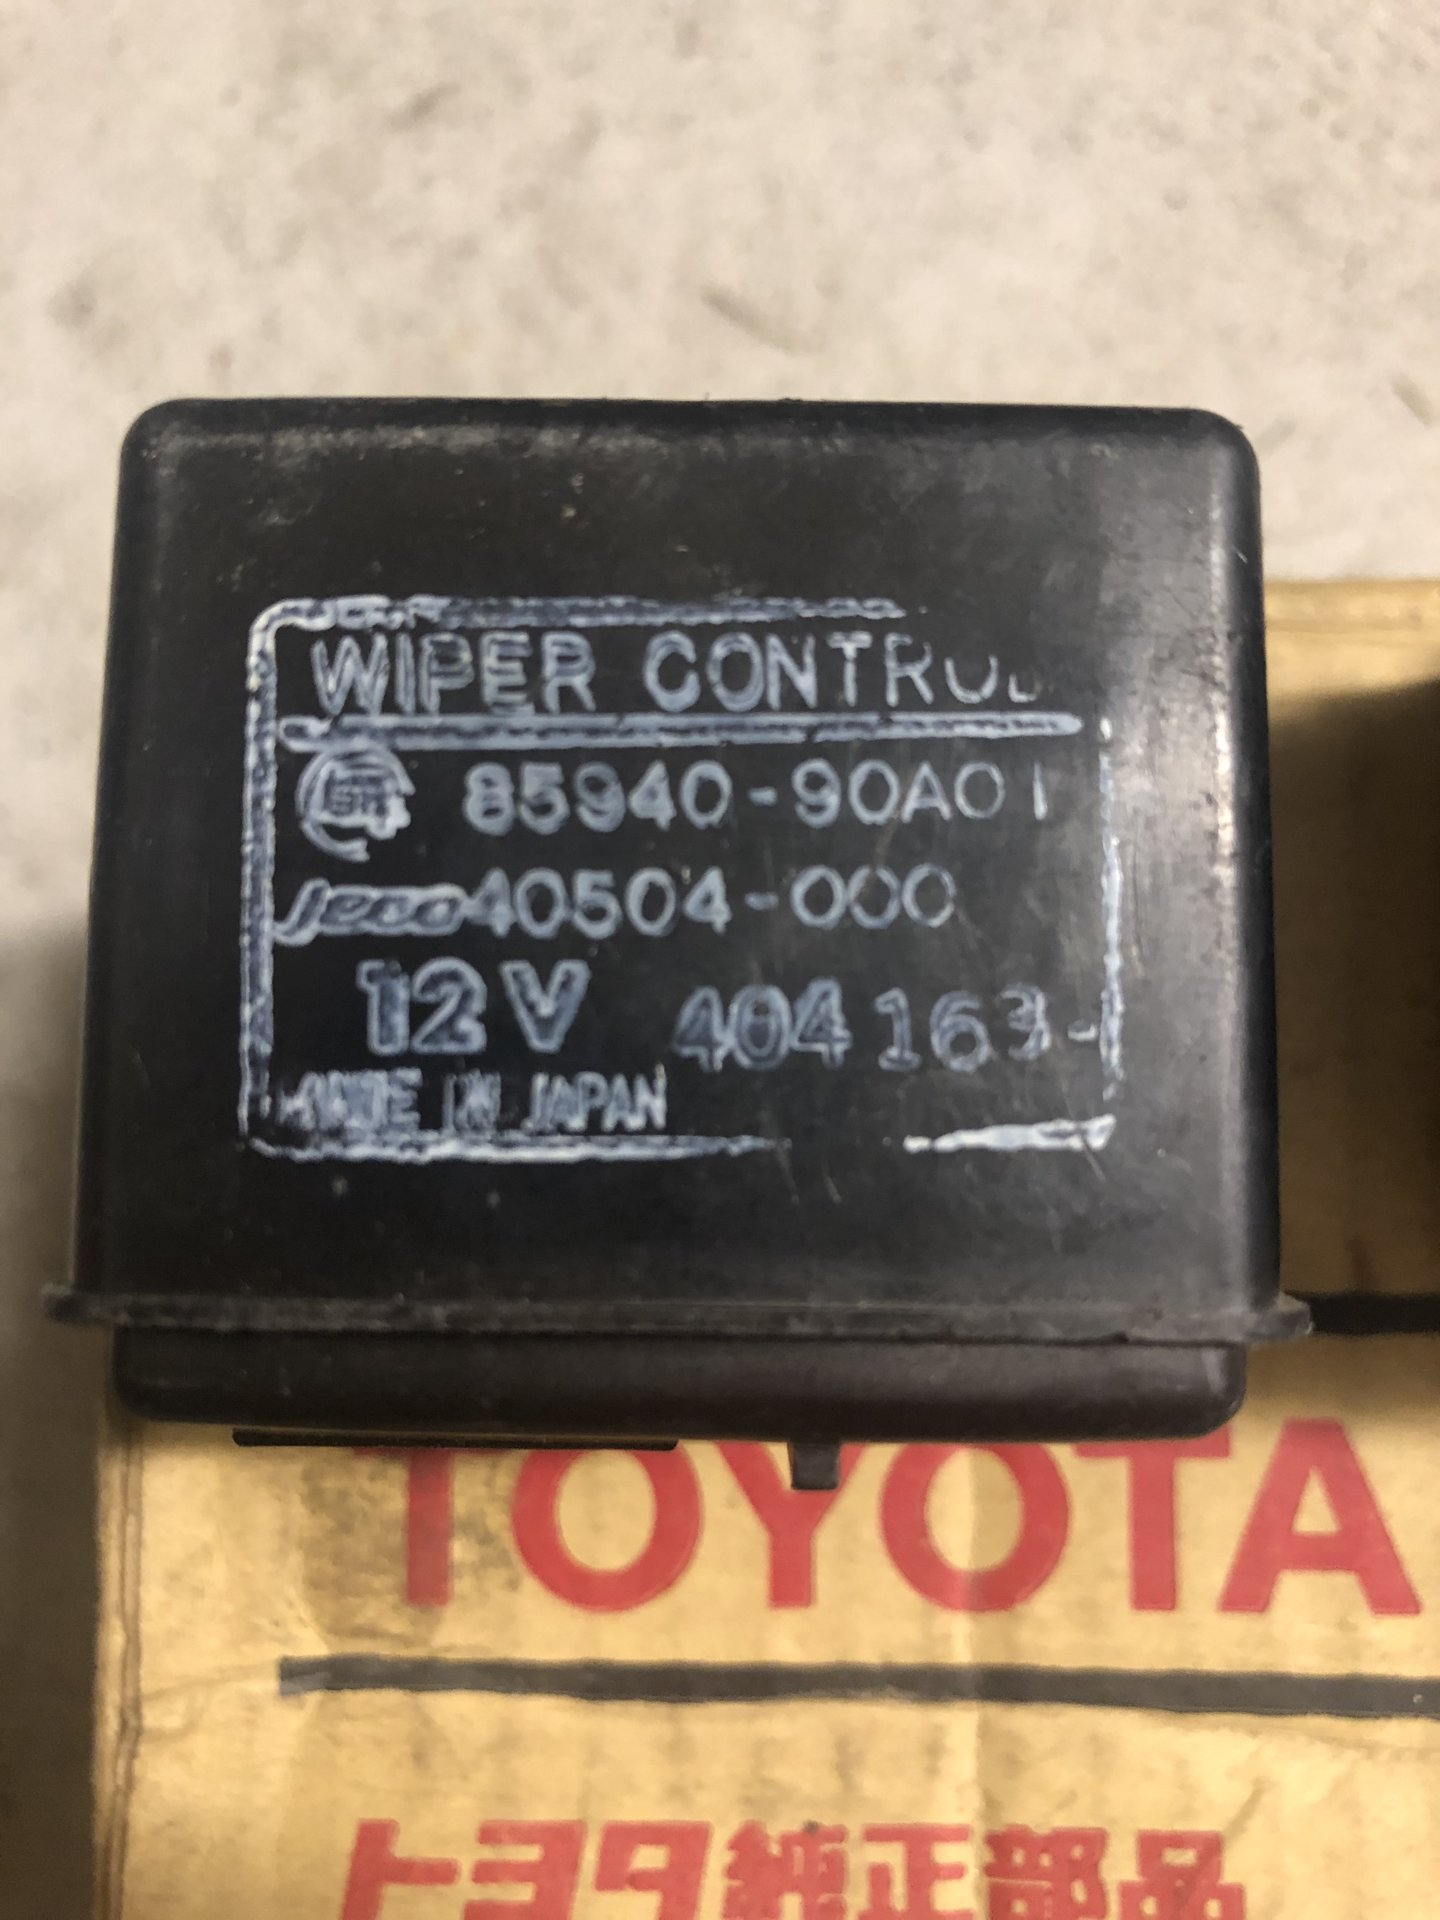 A43BB45E-7427-4F0B-A77B-FE1BAD7014E2.jpeg